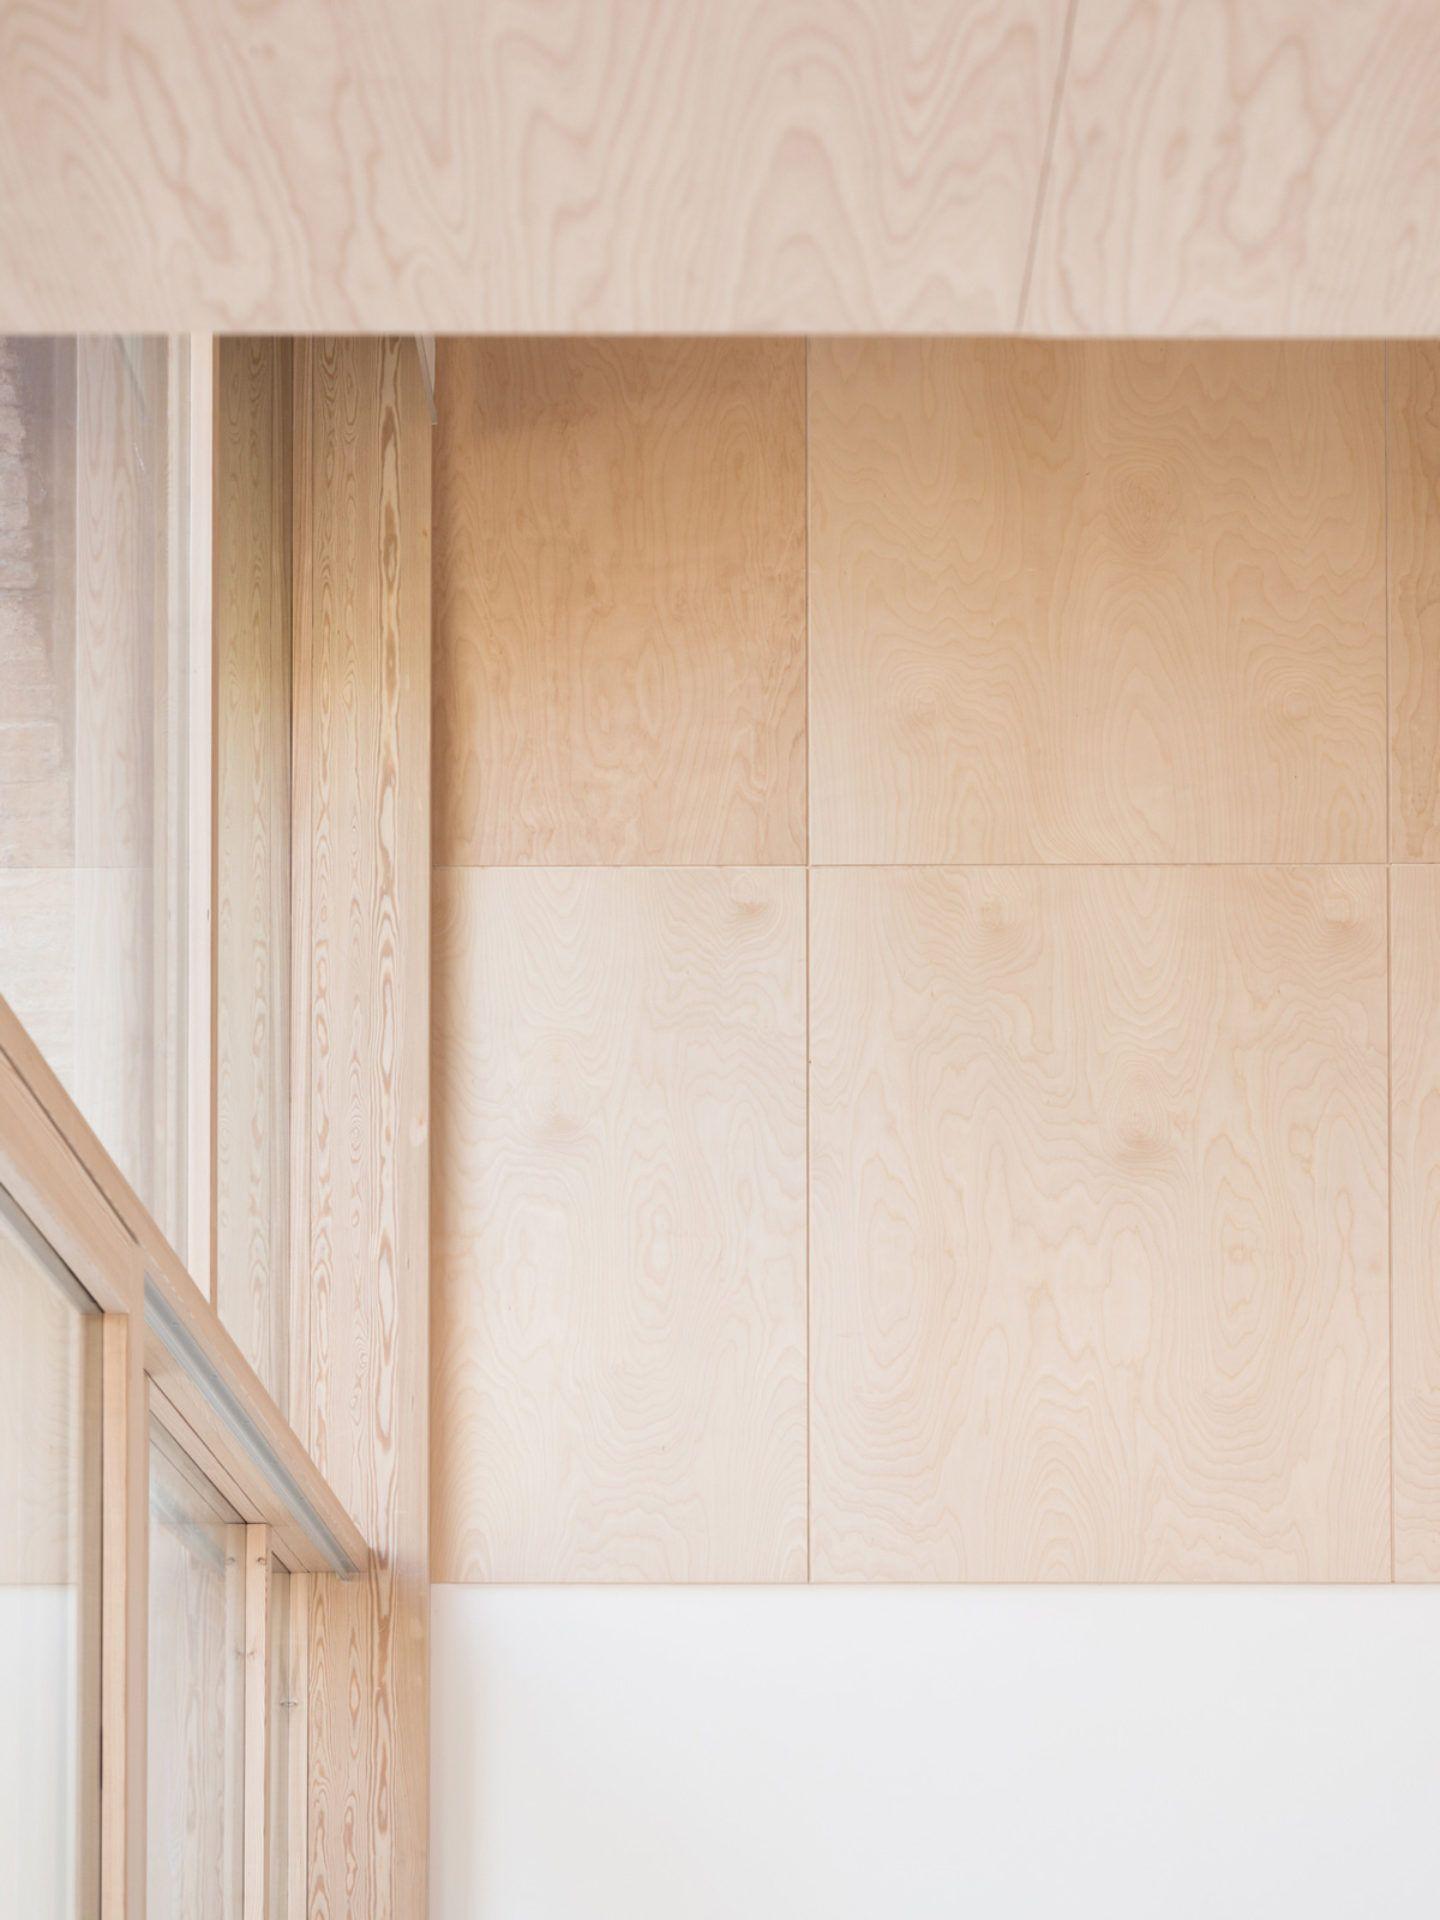 IGNANT-Architecture-Studio-Wok-Country-Home-In-Chievo-9